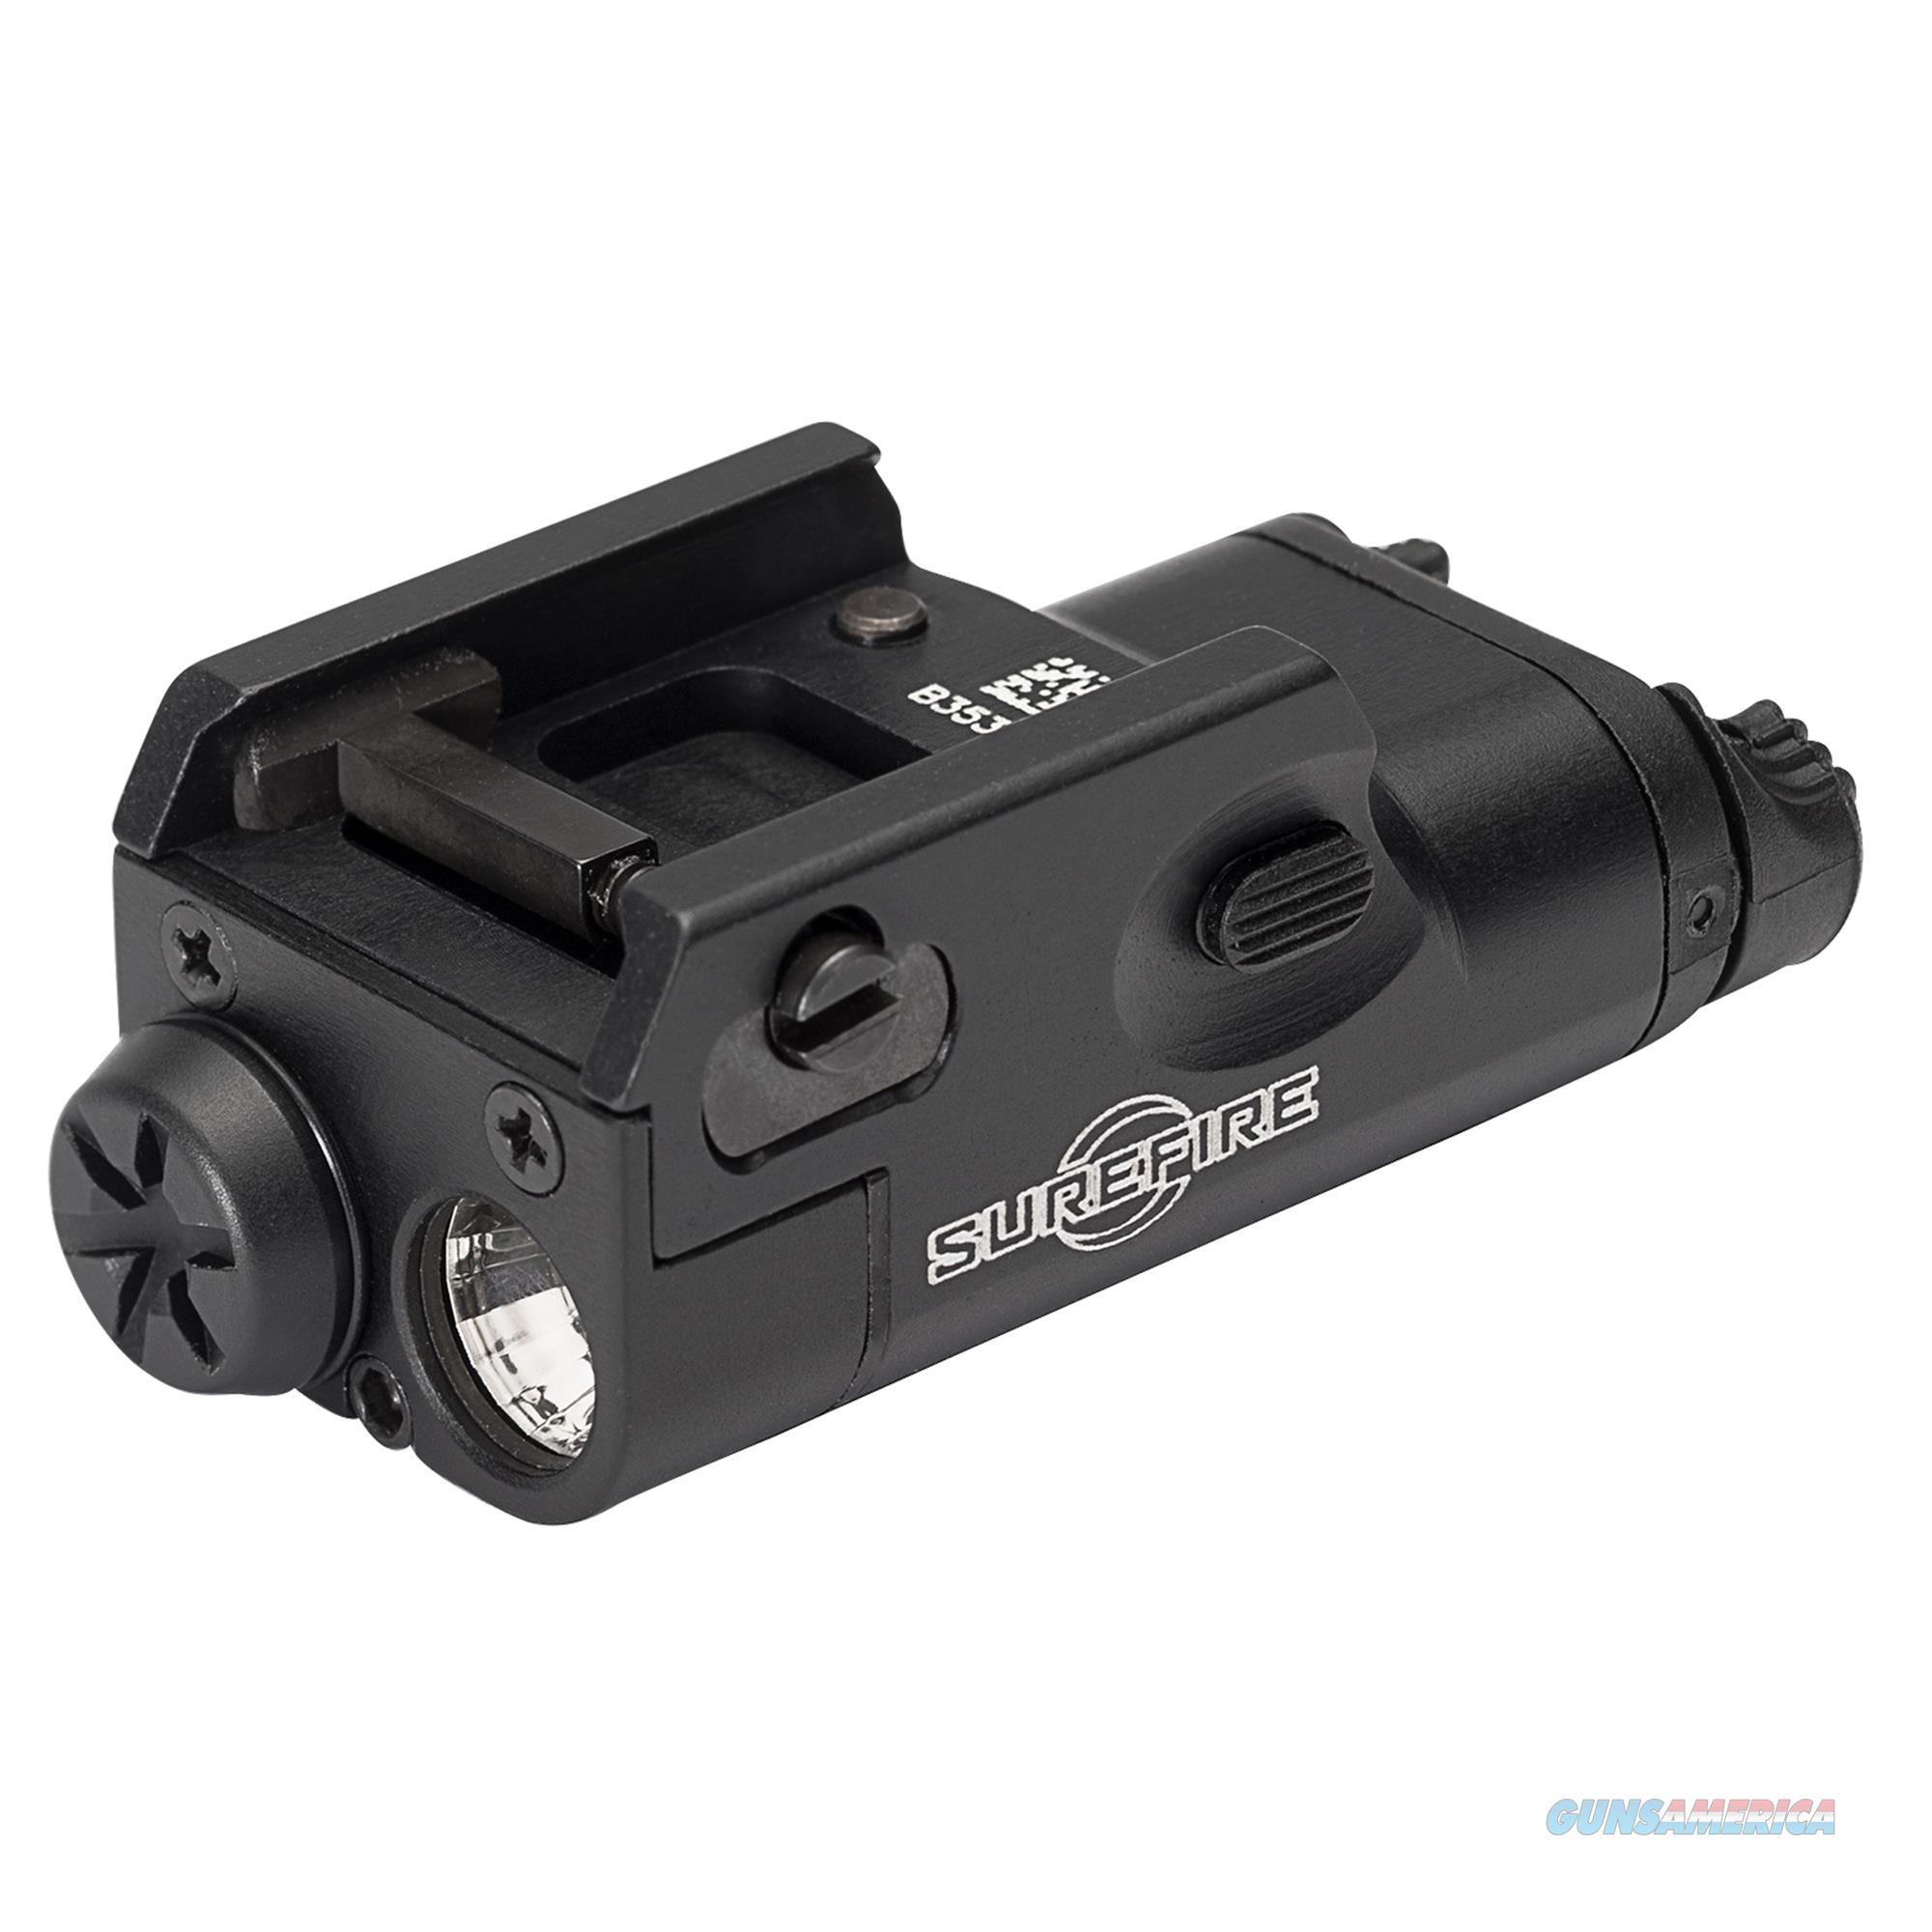 Surefire Xc1 Compact Pistol Light With Mount, 200 Lumens, Black XC1  Non-Guns > Miscellaneous